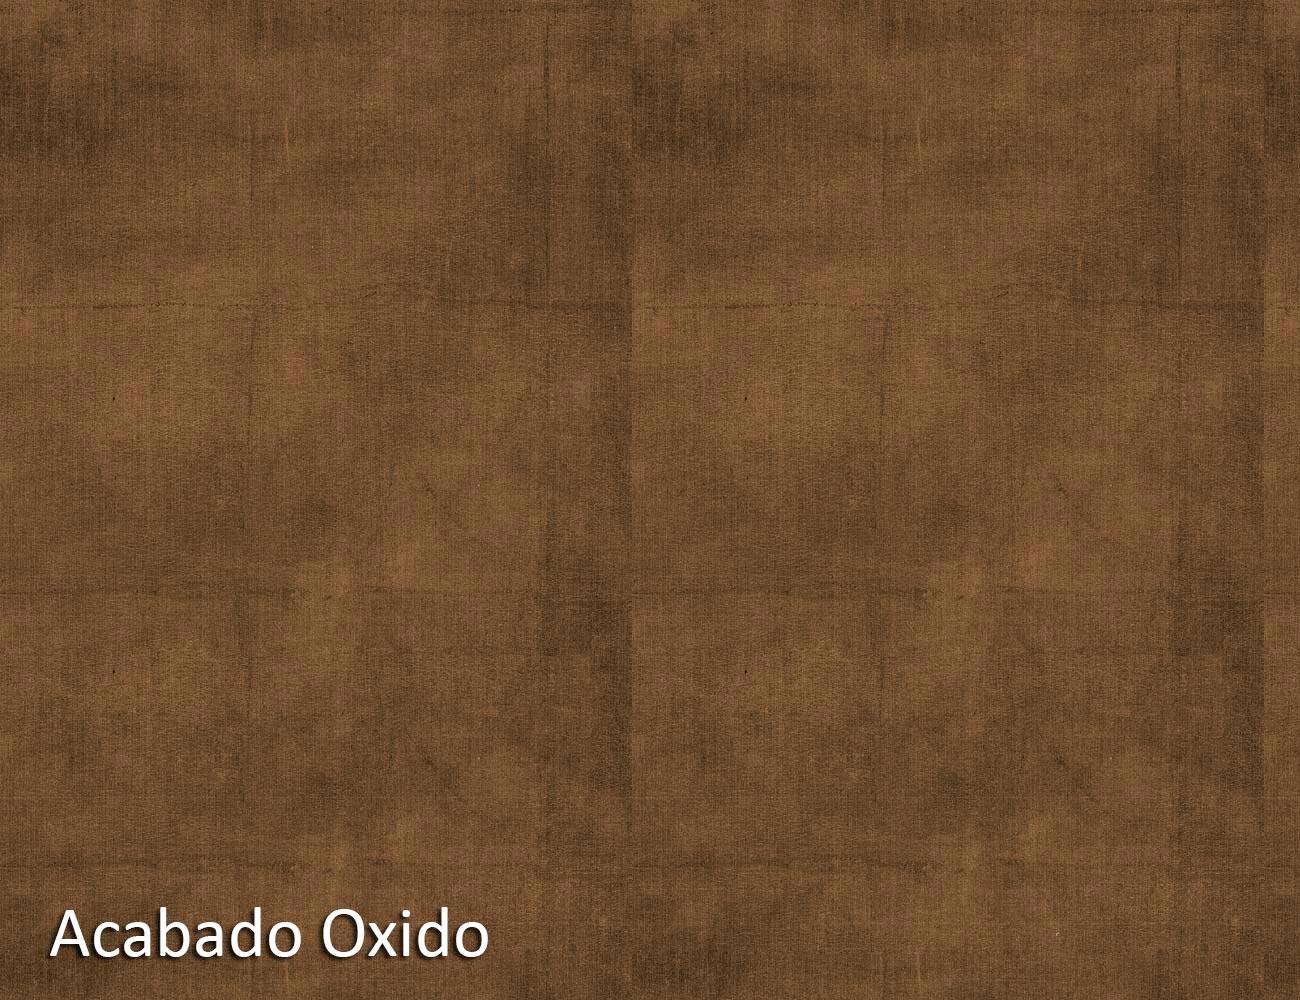 Acabado oxido3